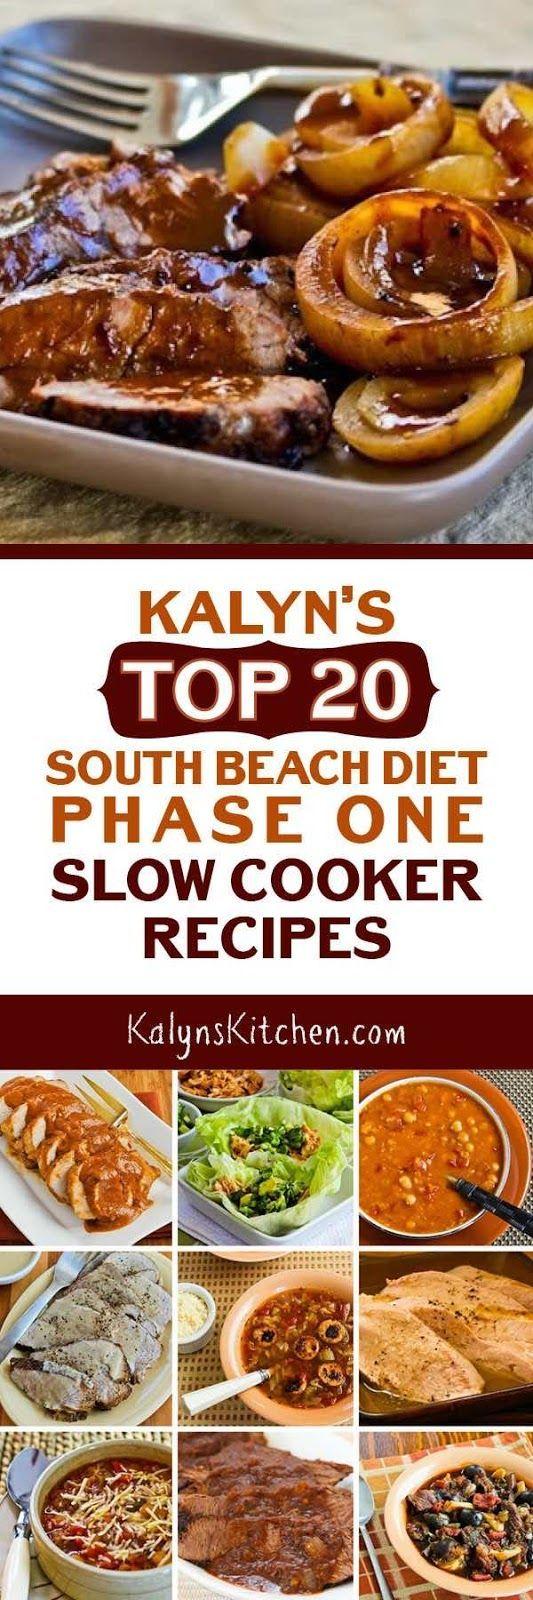 Kalyns Top 20 Südstrand Diät Phase 1 Slow Cooker Rezepte, #Cooker #Diät #Kalyns #Phase #Reze…